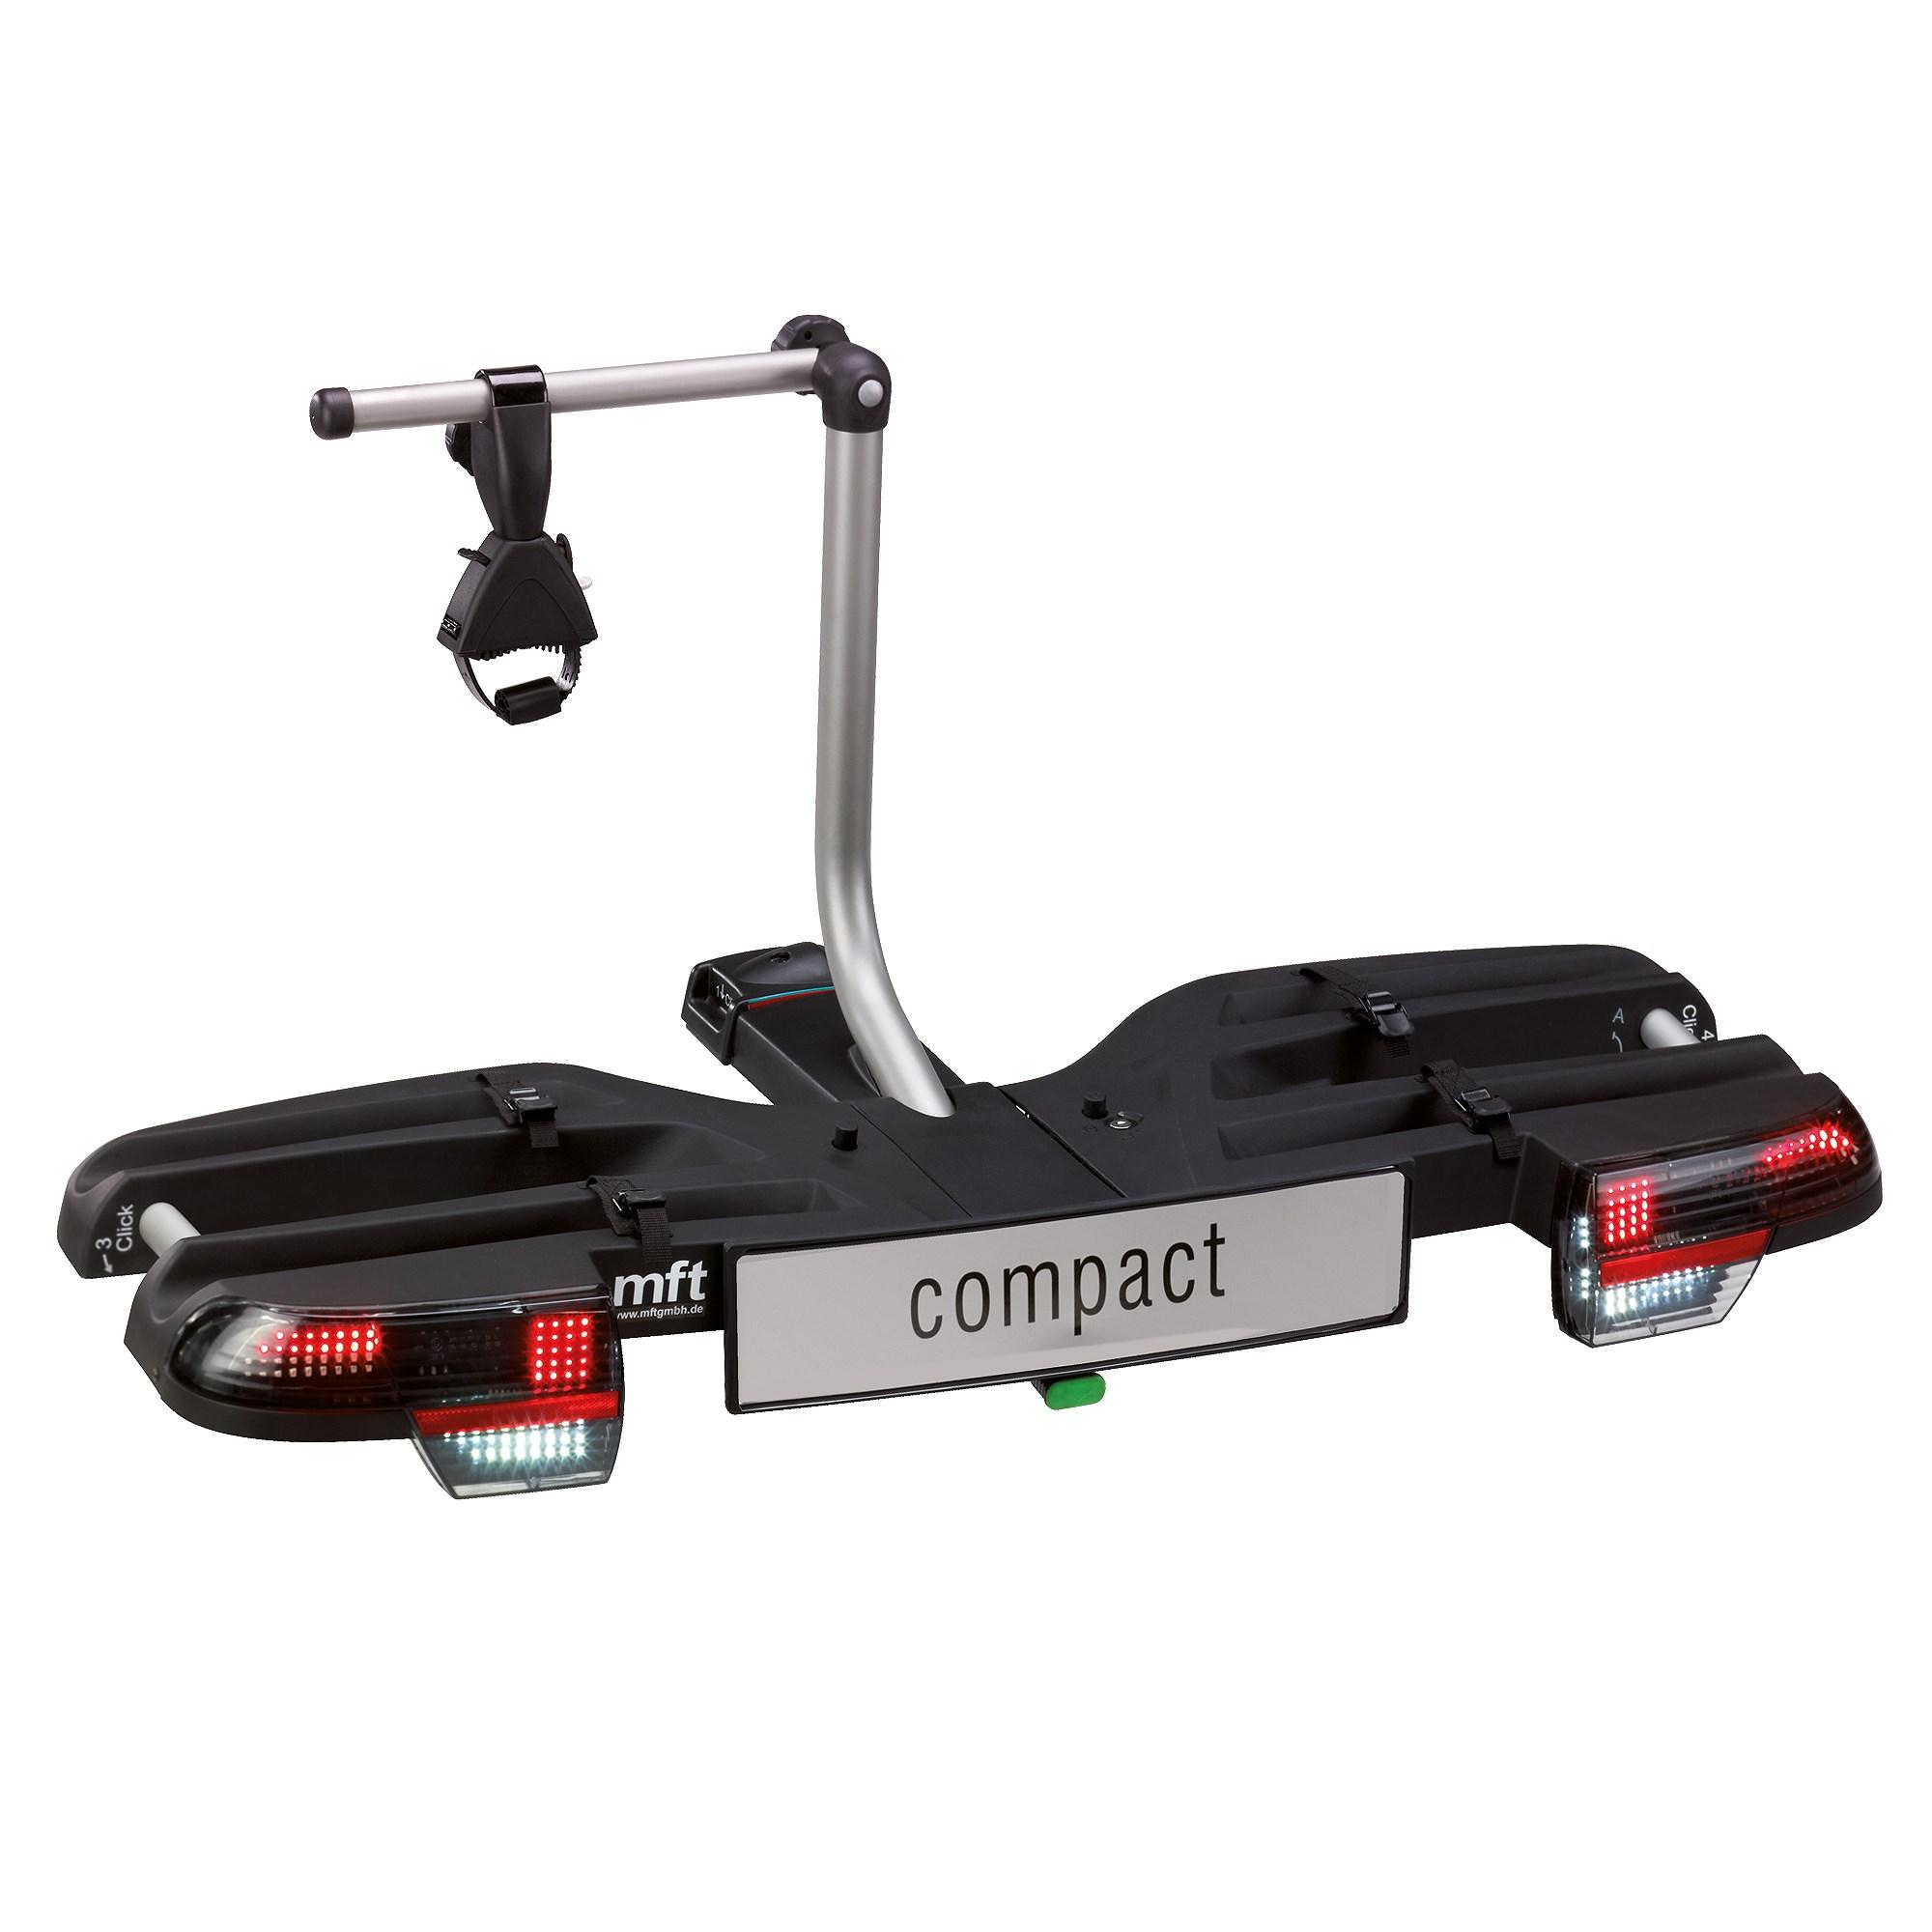 mft euro select compact fahrradtr ger ahk atp autoteile. Black Bedroom Furniture Sets. Home Design Ideas